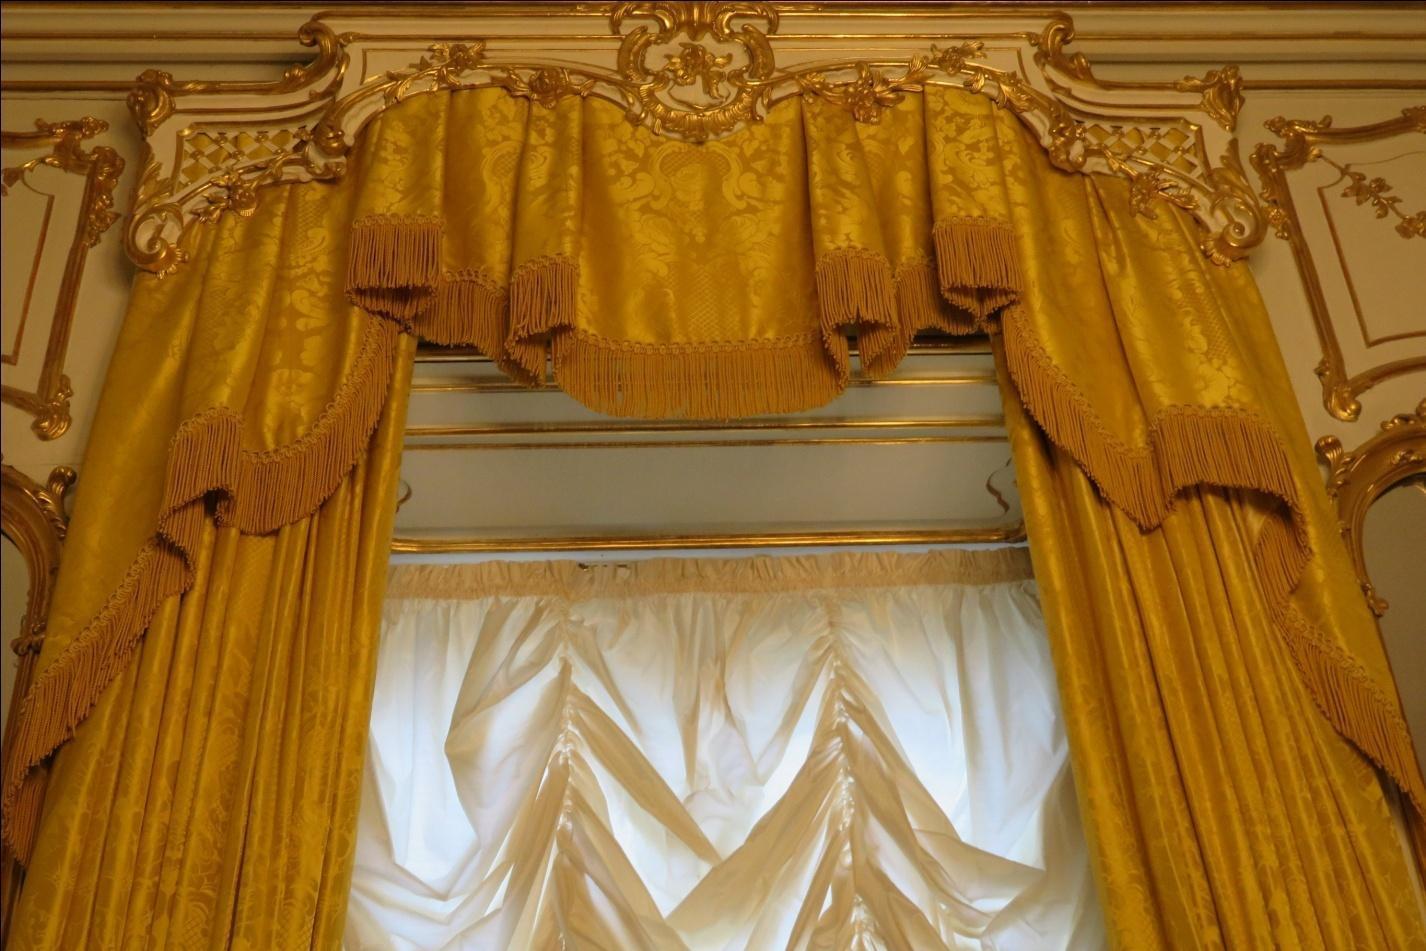 C:\Users\sdwaed\Desktop\curtains-drapes-elegant-fabric-1745828.jpg